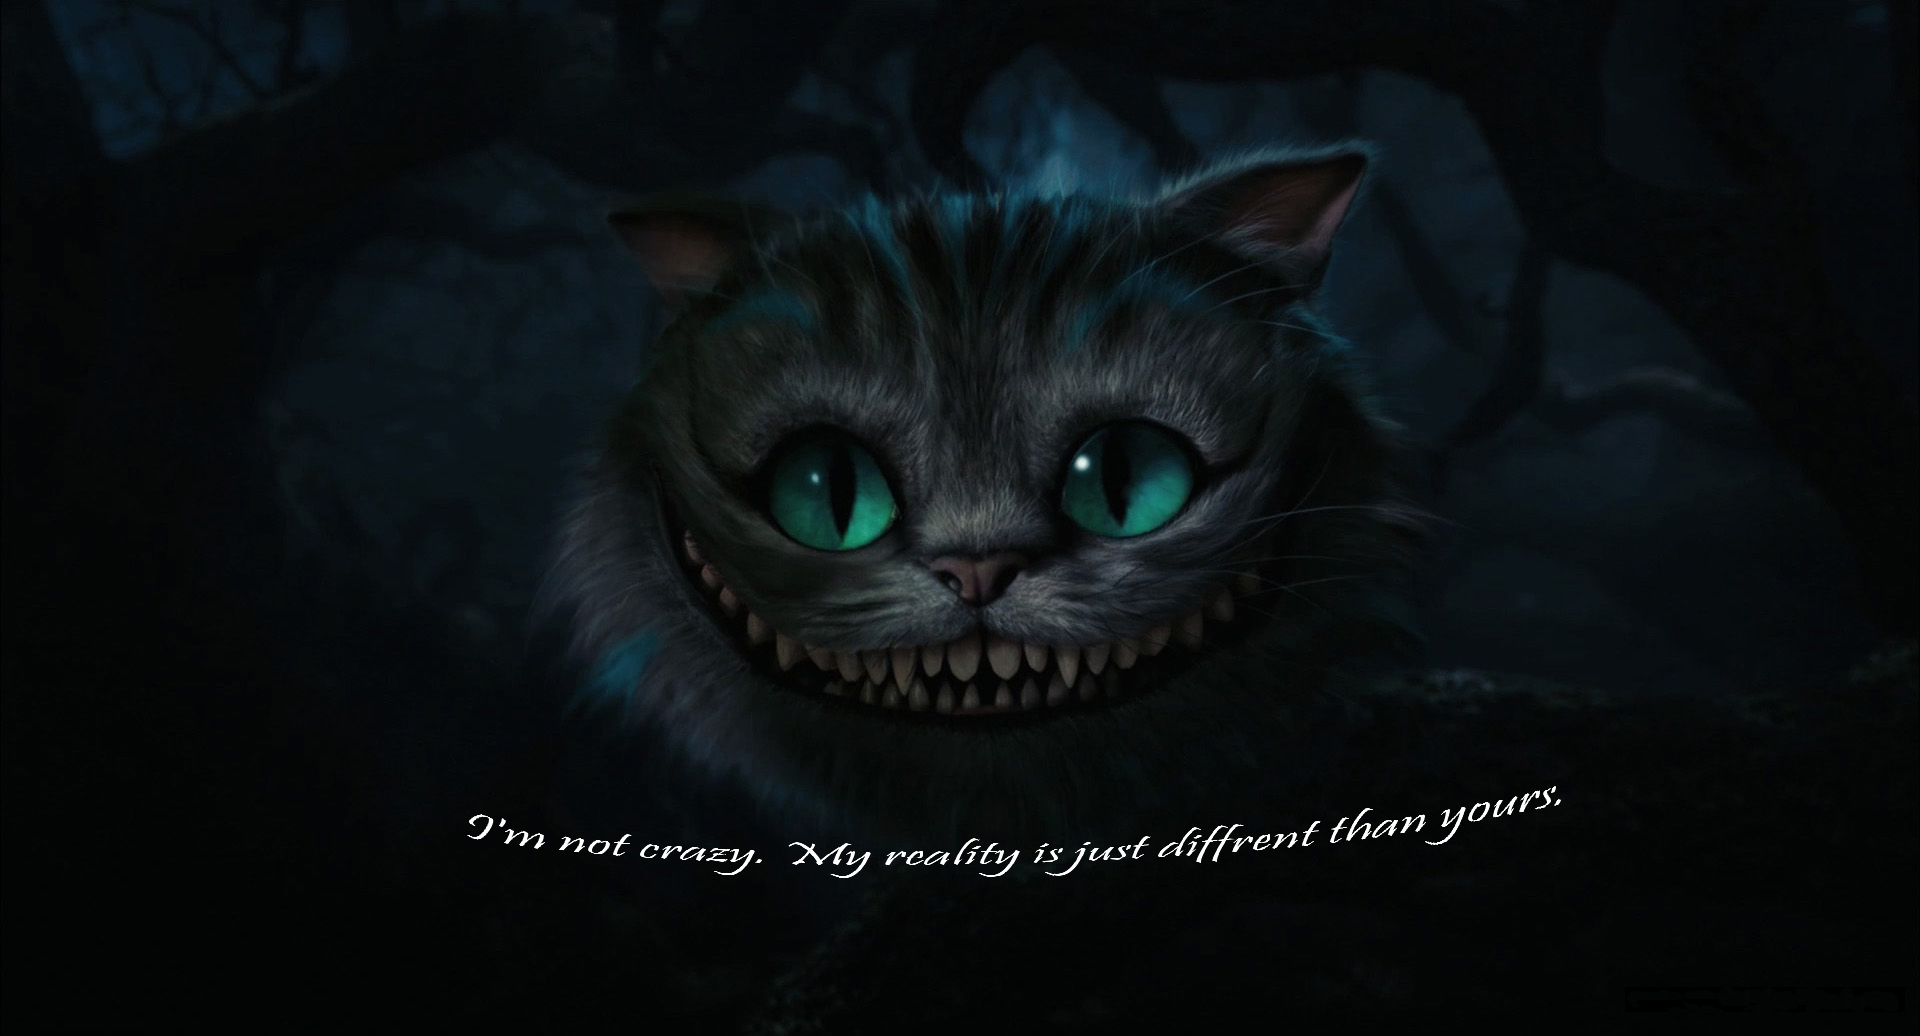 Cheshire Cat From Alice In Wonderland Quotes Quotesgram